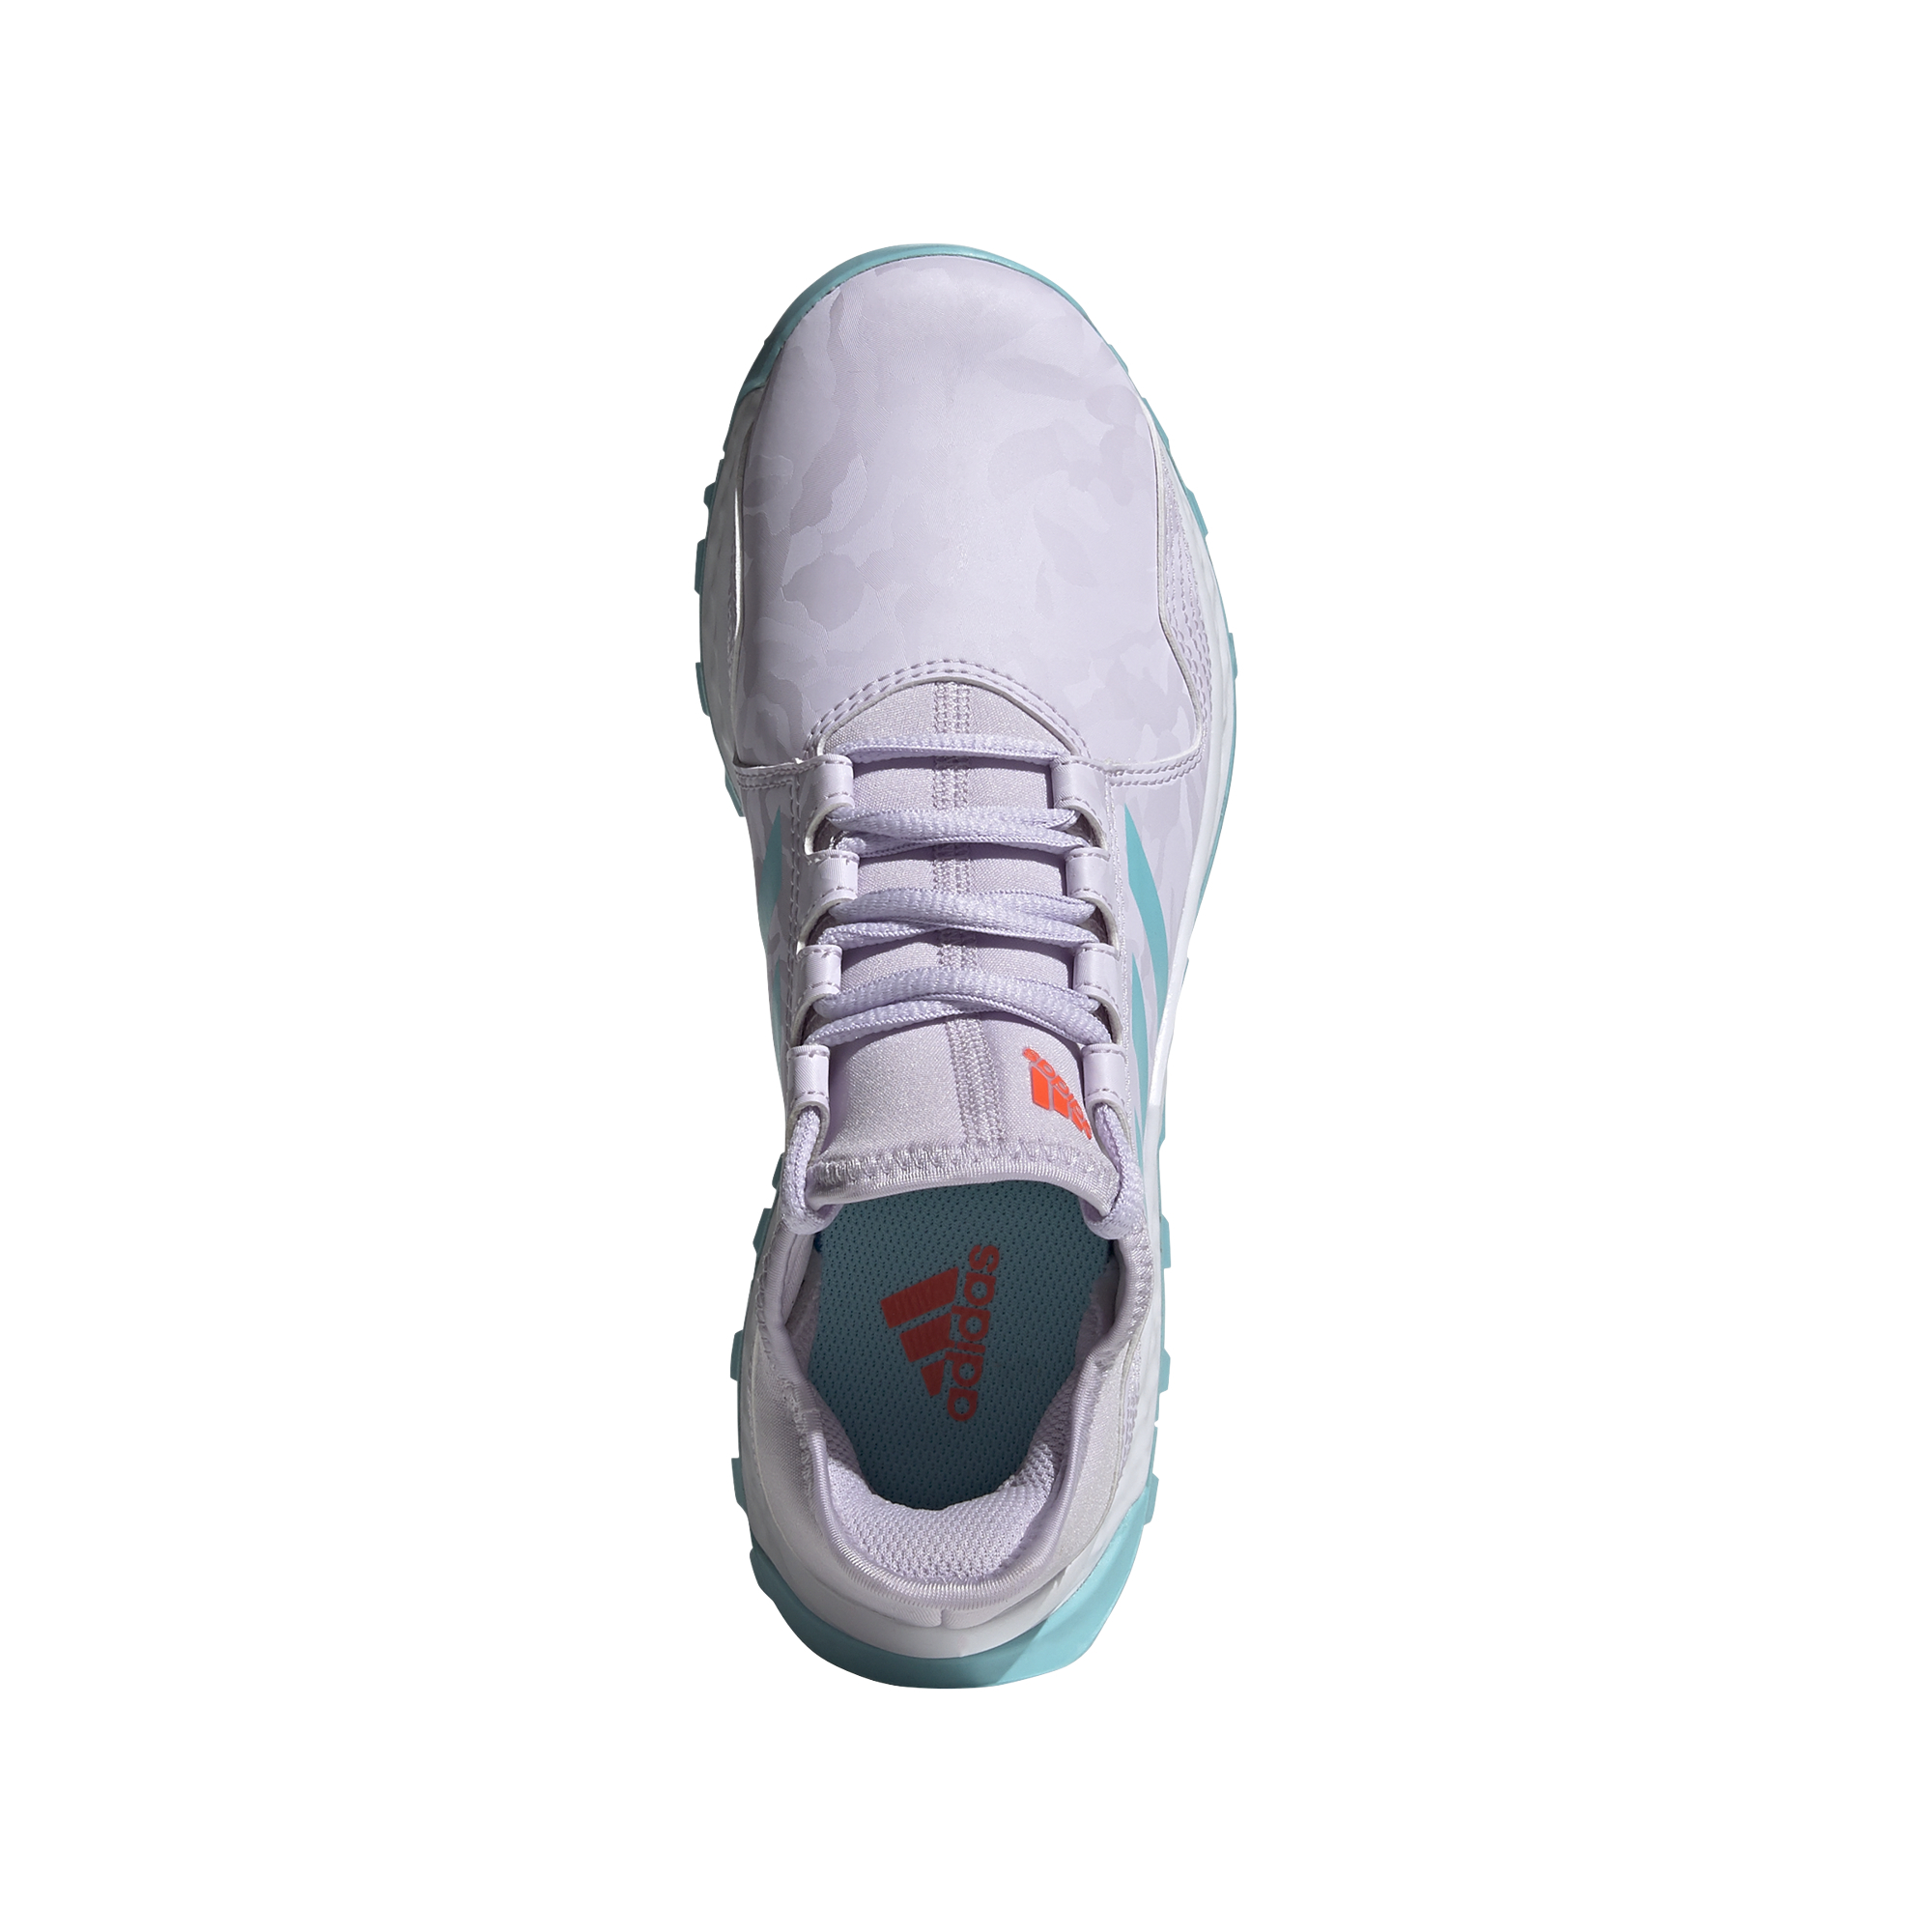 Adidas Youngstar Purple Hockey Shoes